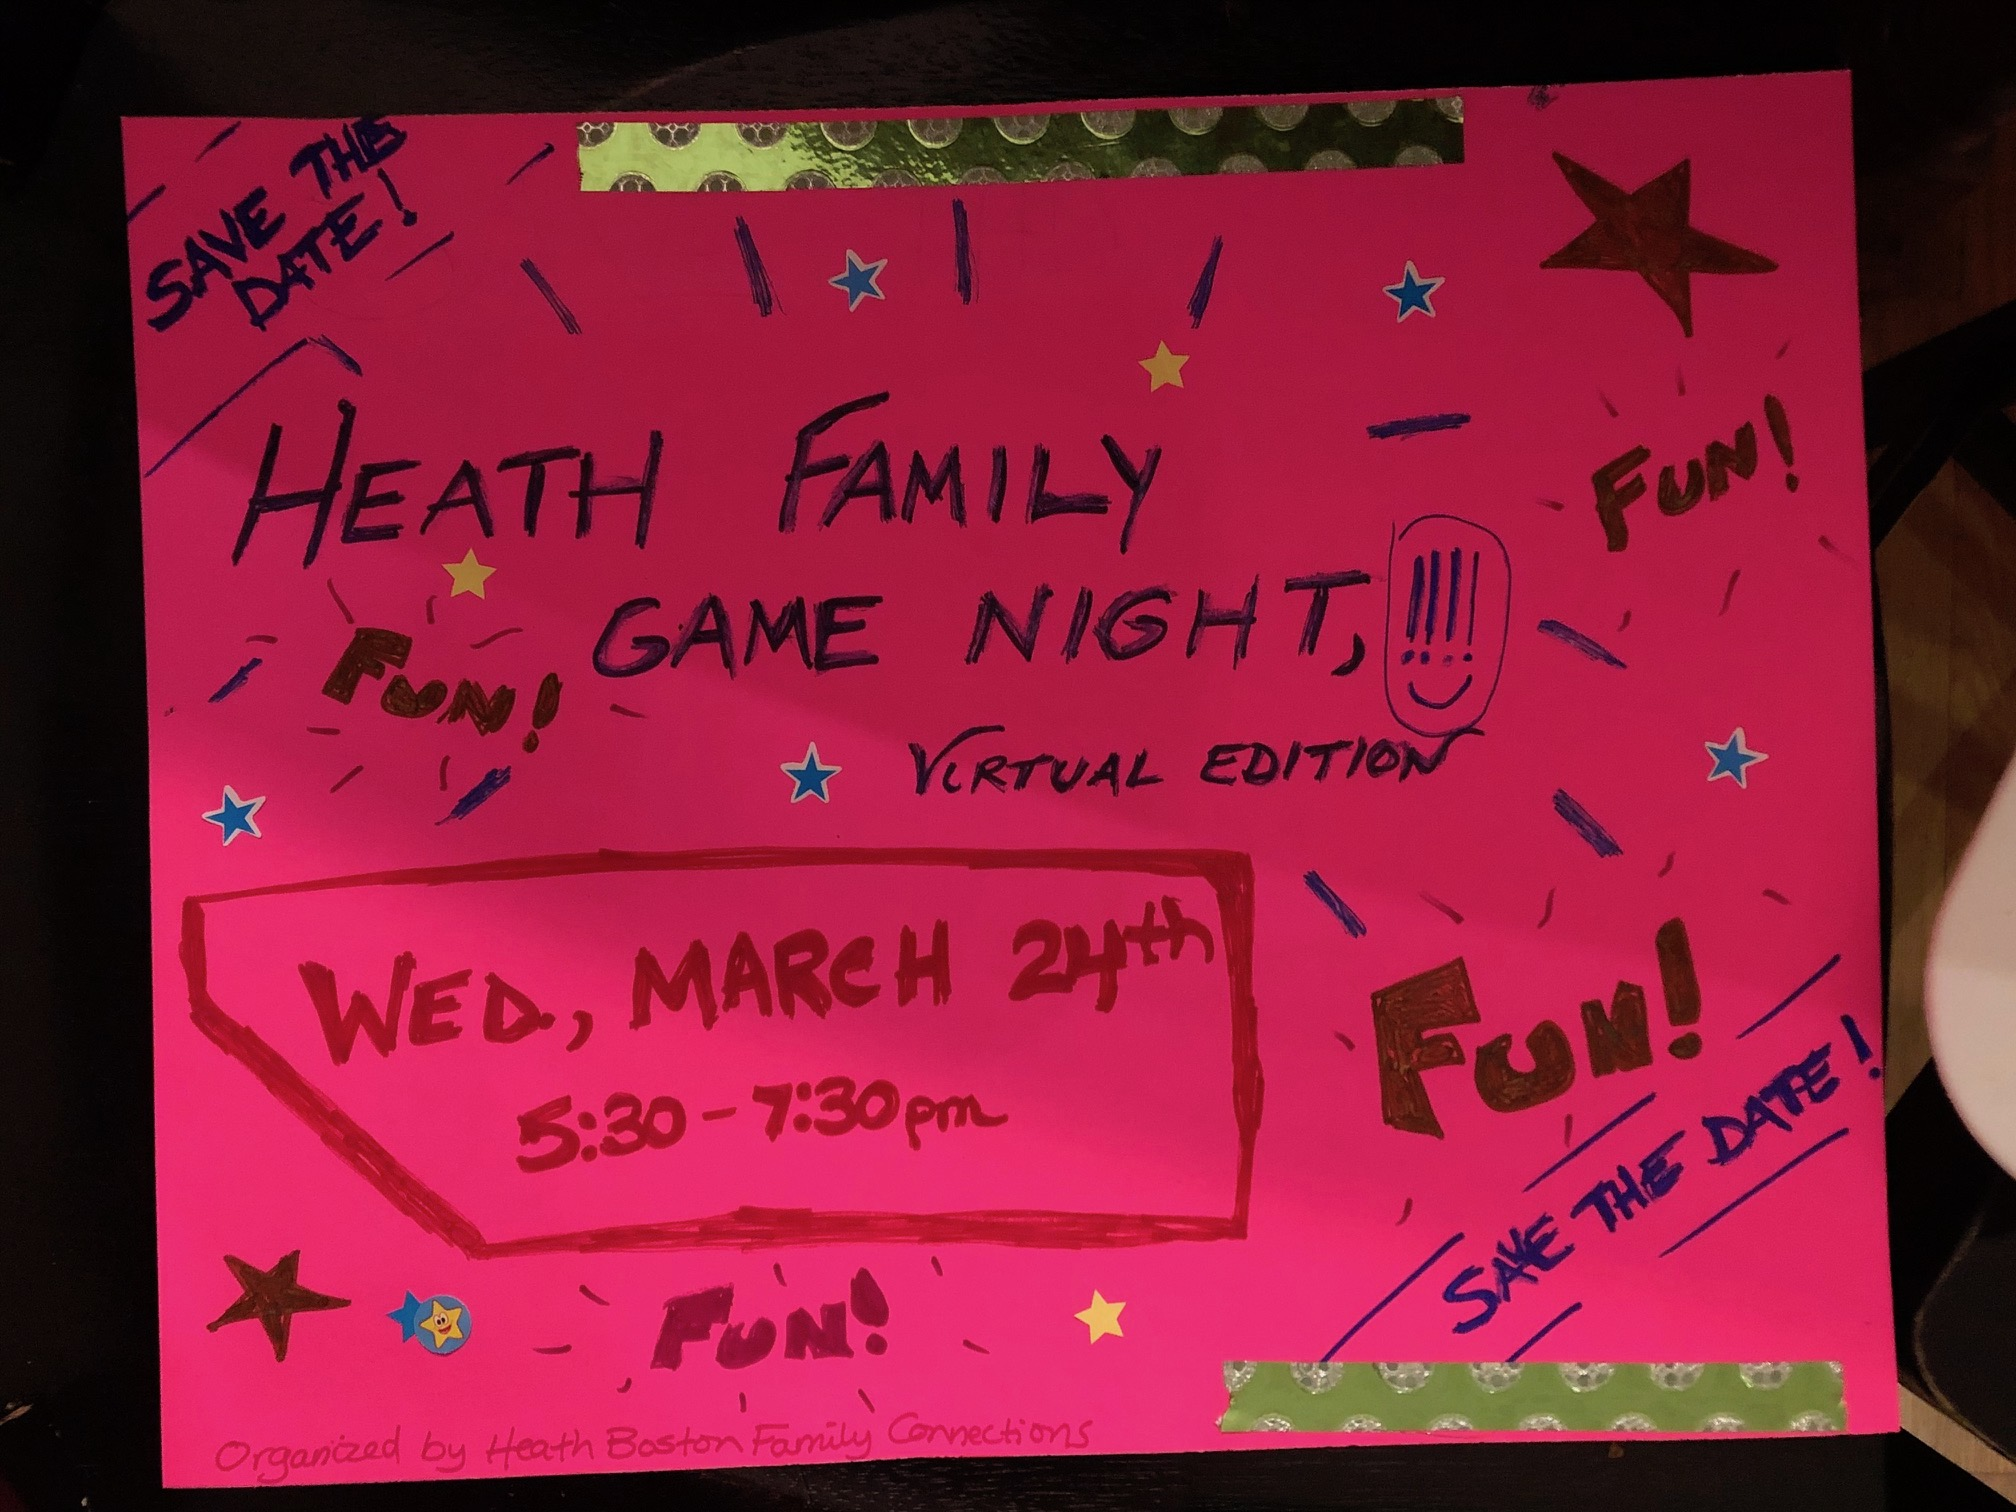 Heath Family Game Night 2021 Virtual Edition